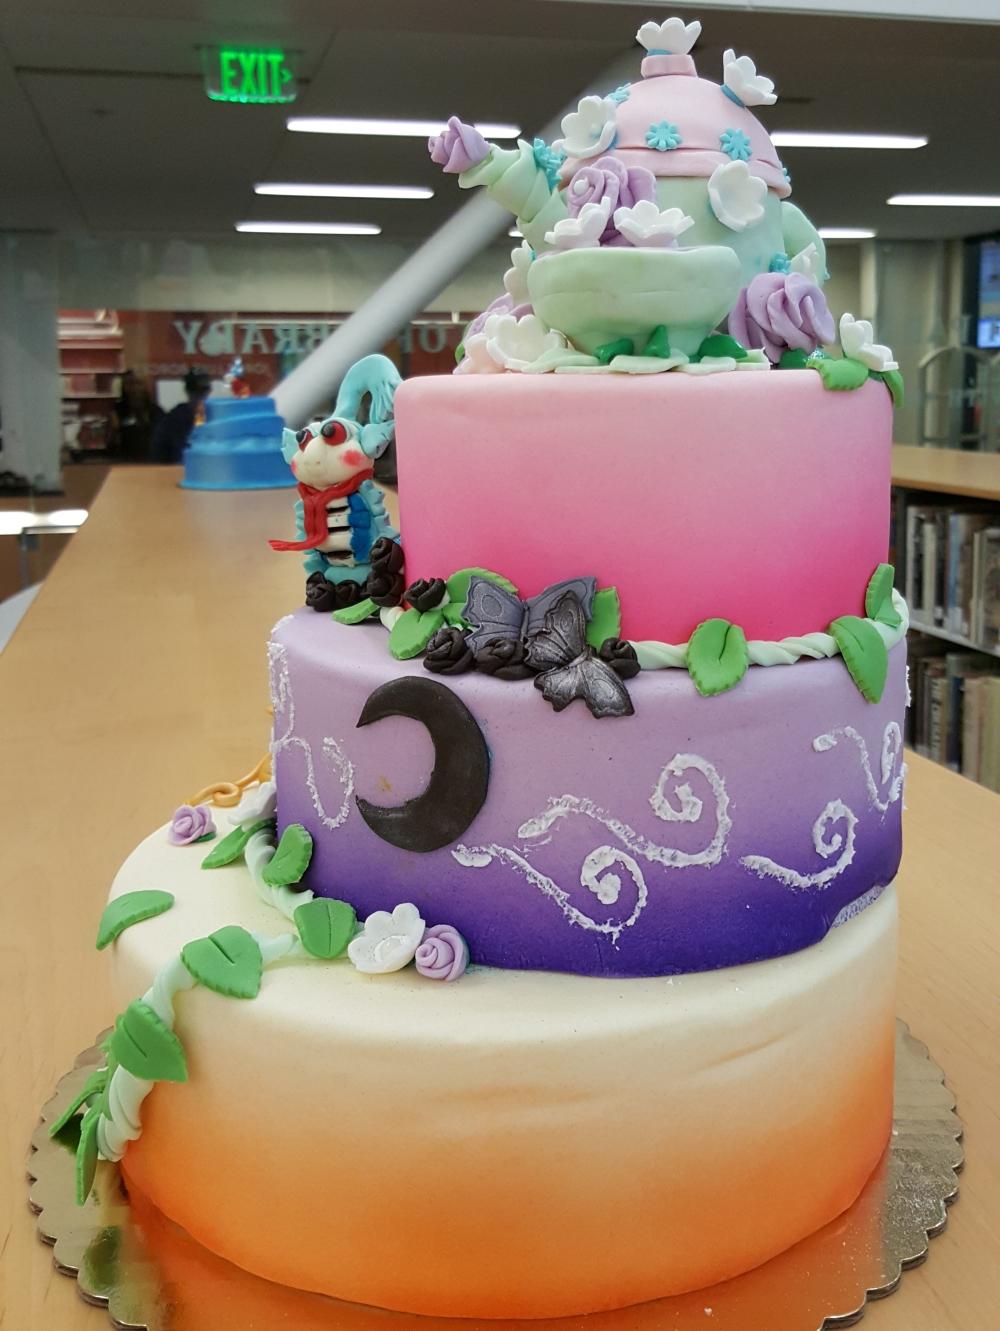 2018 Cakes Alice in Wonderland - back view